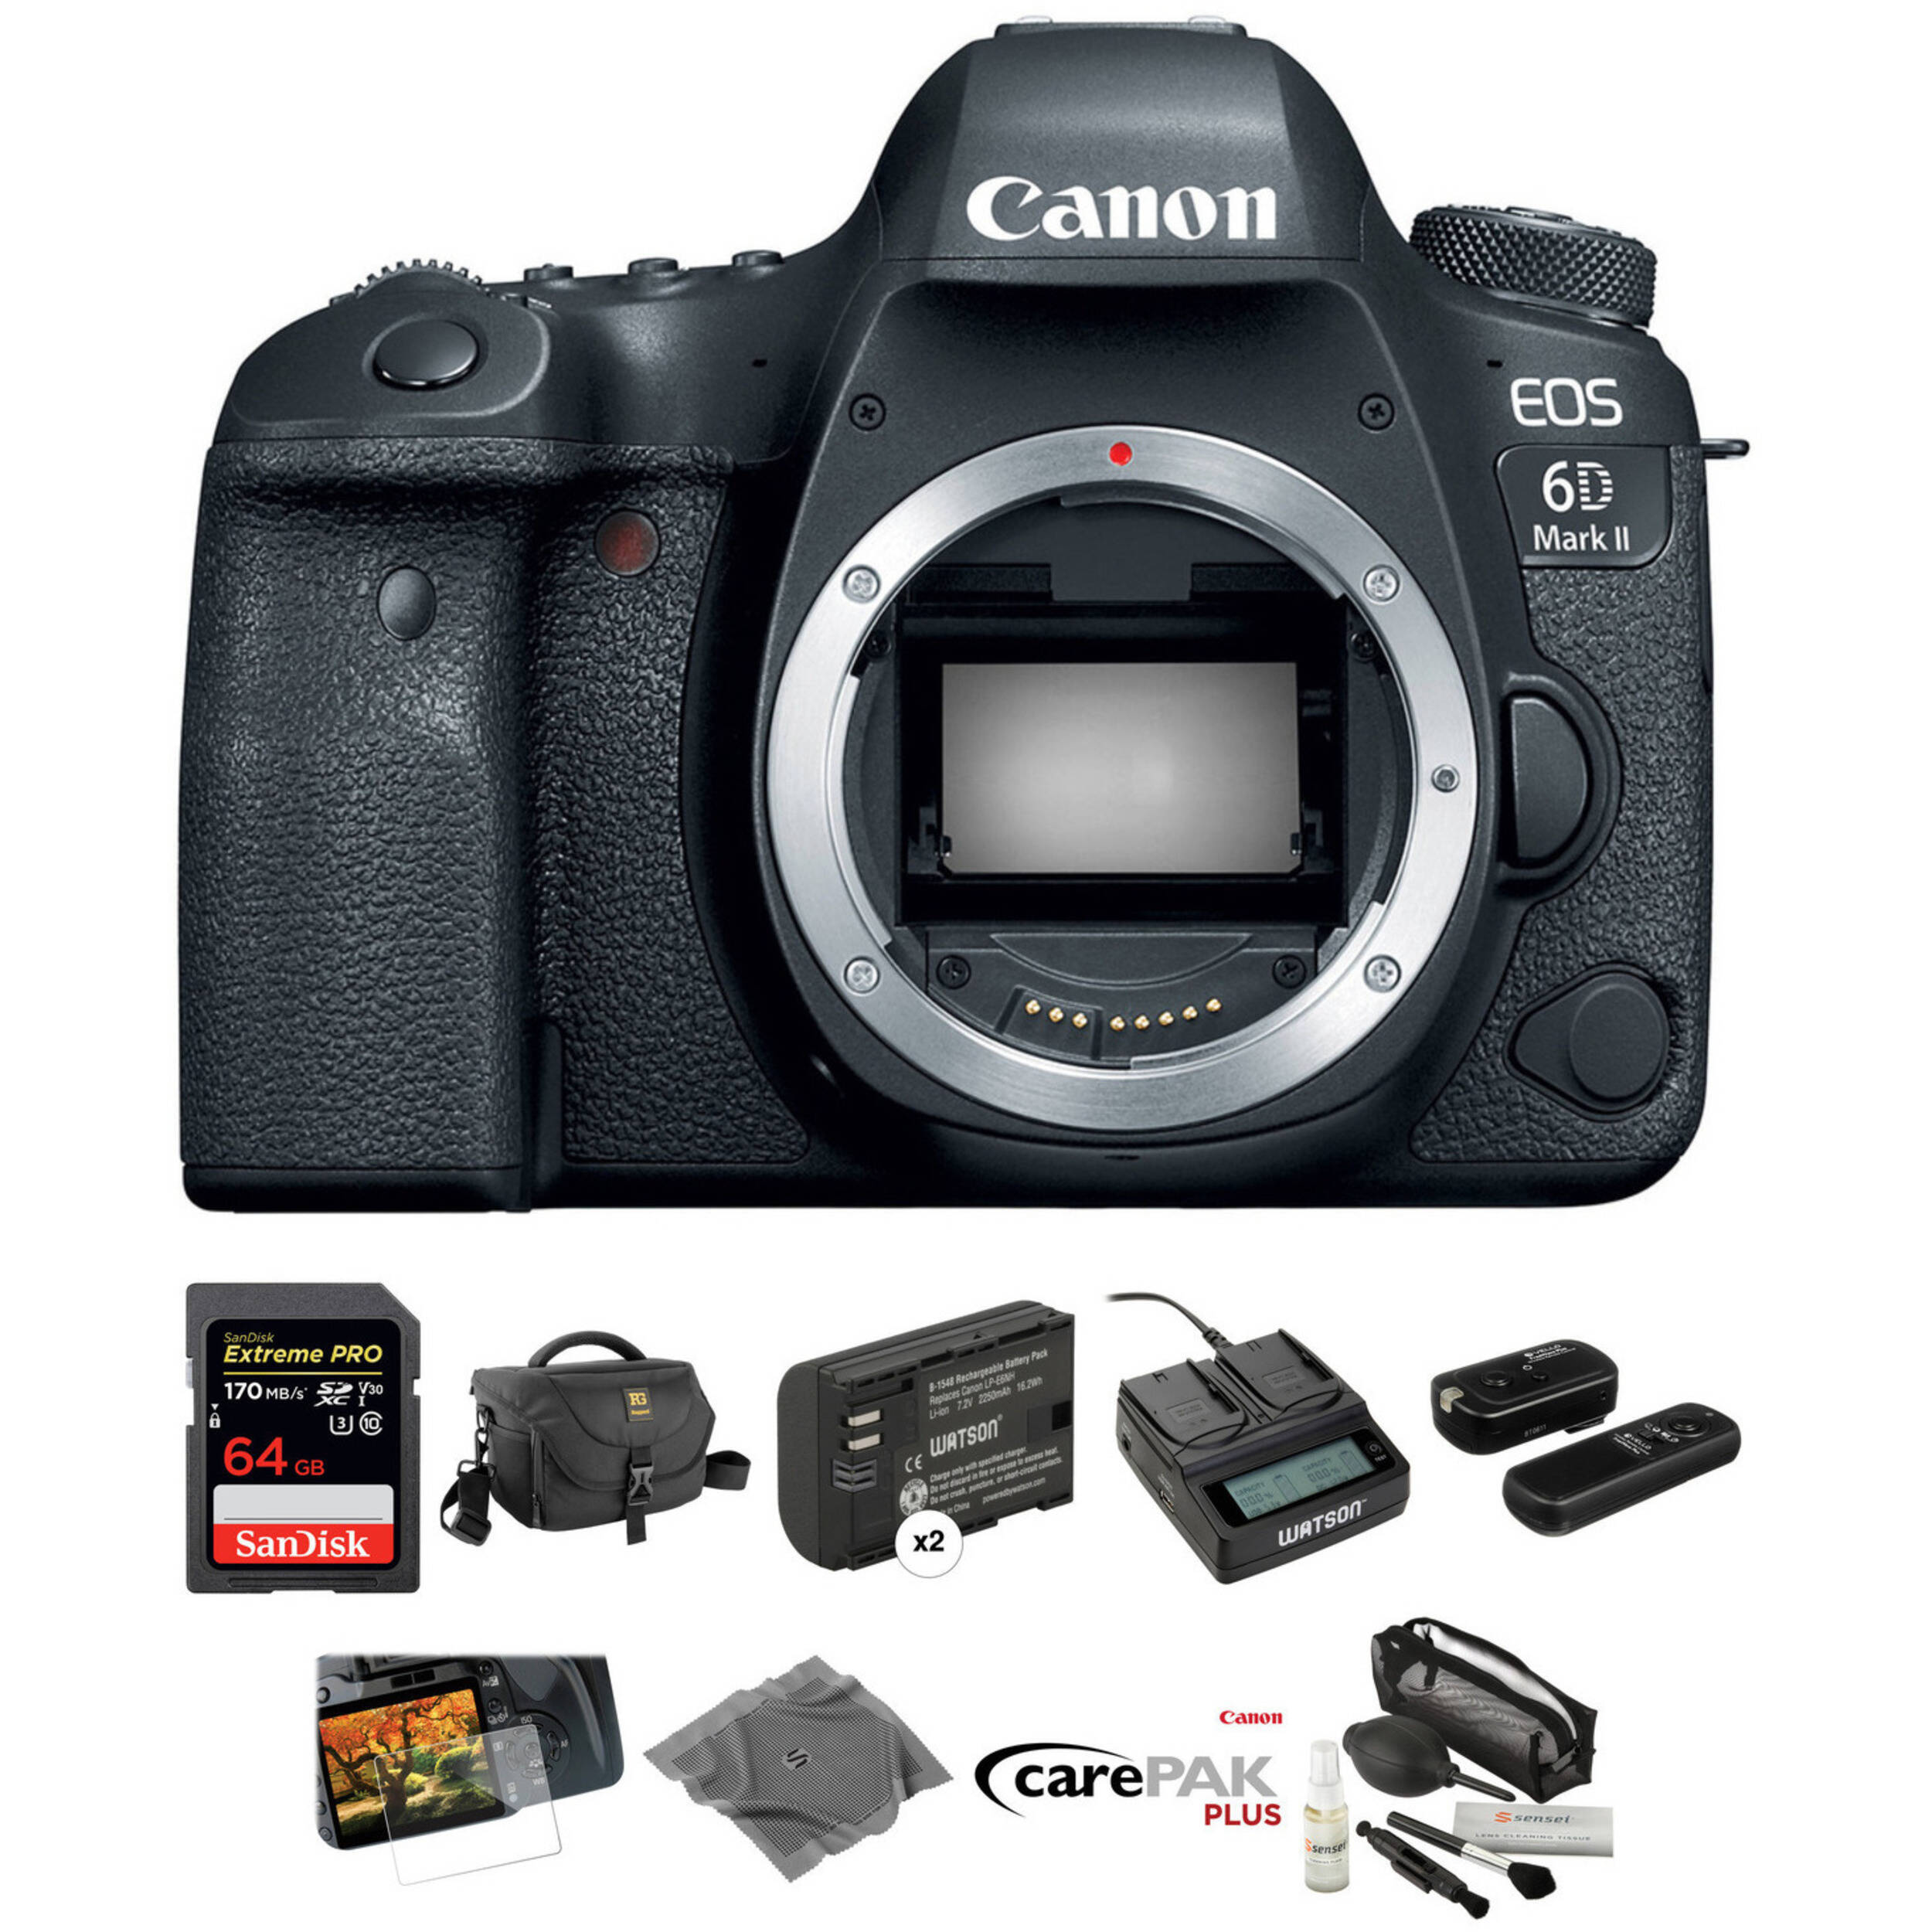 Canon Eos 6d Mark Ii Dslr Camera Body Deluxe Kit B Amp H Photo